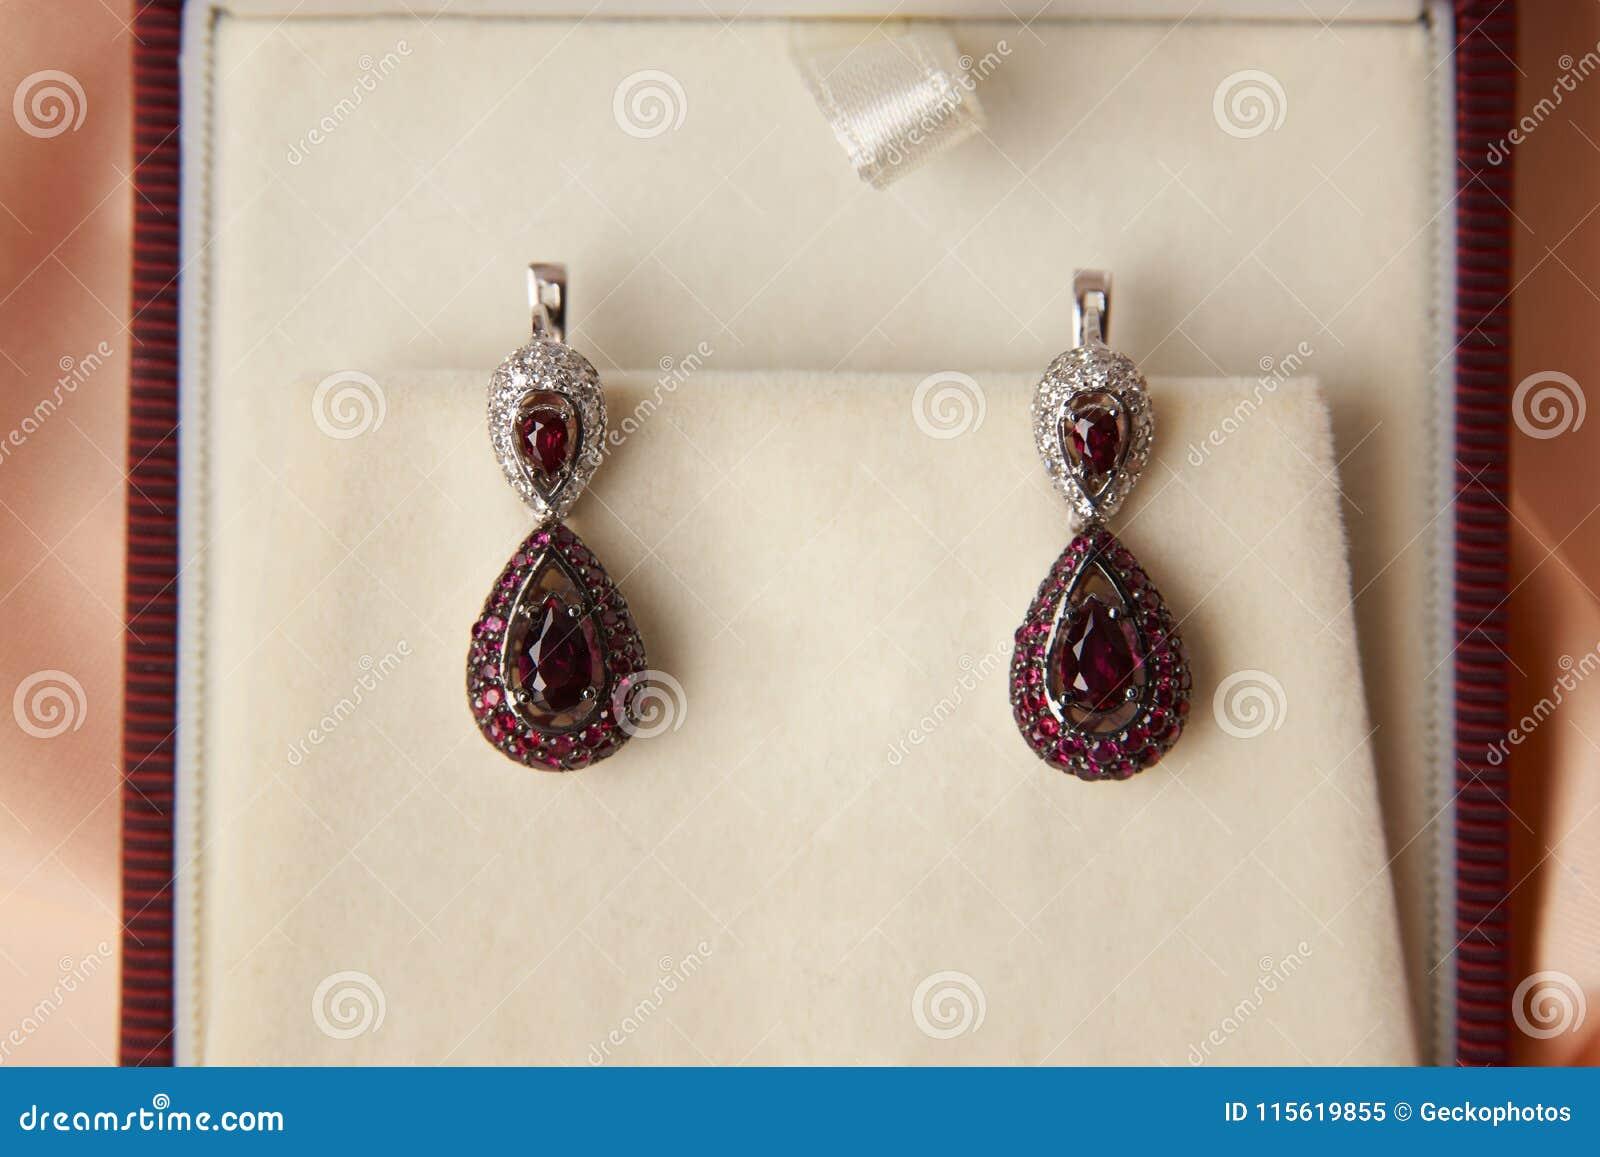 Pair Of Ruby Diamond Earrings In Jewelry Box Stock Image Image